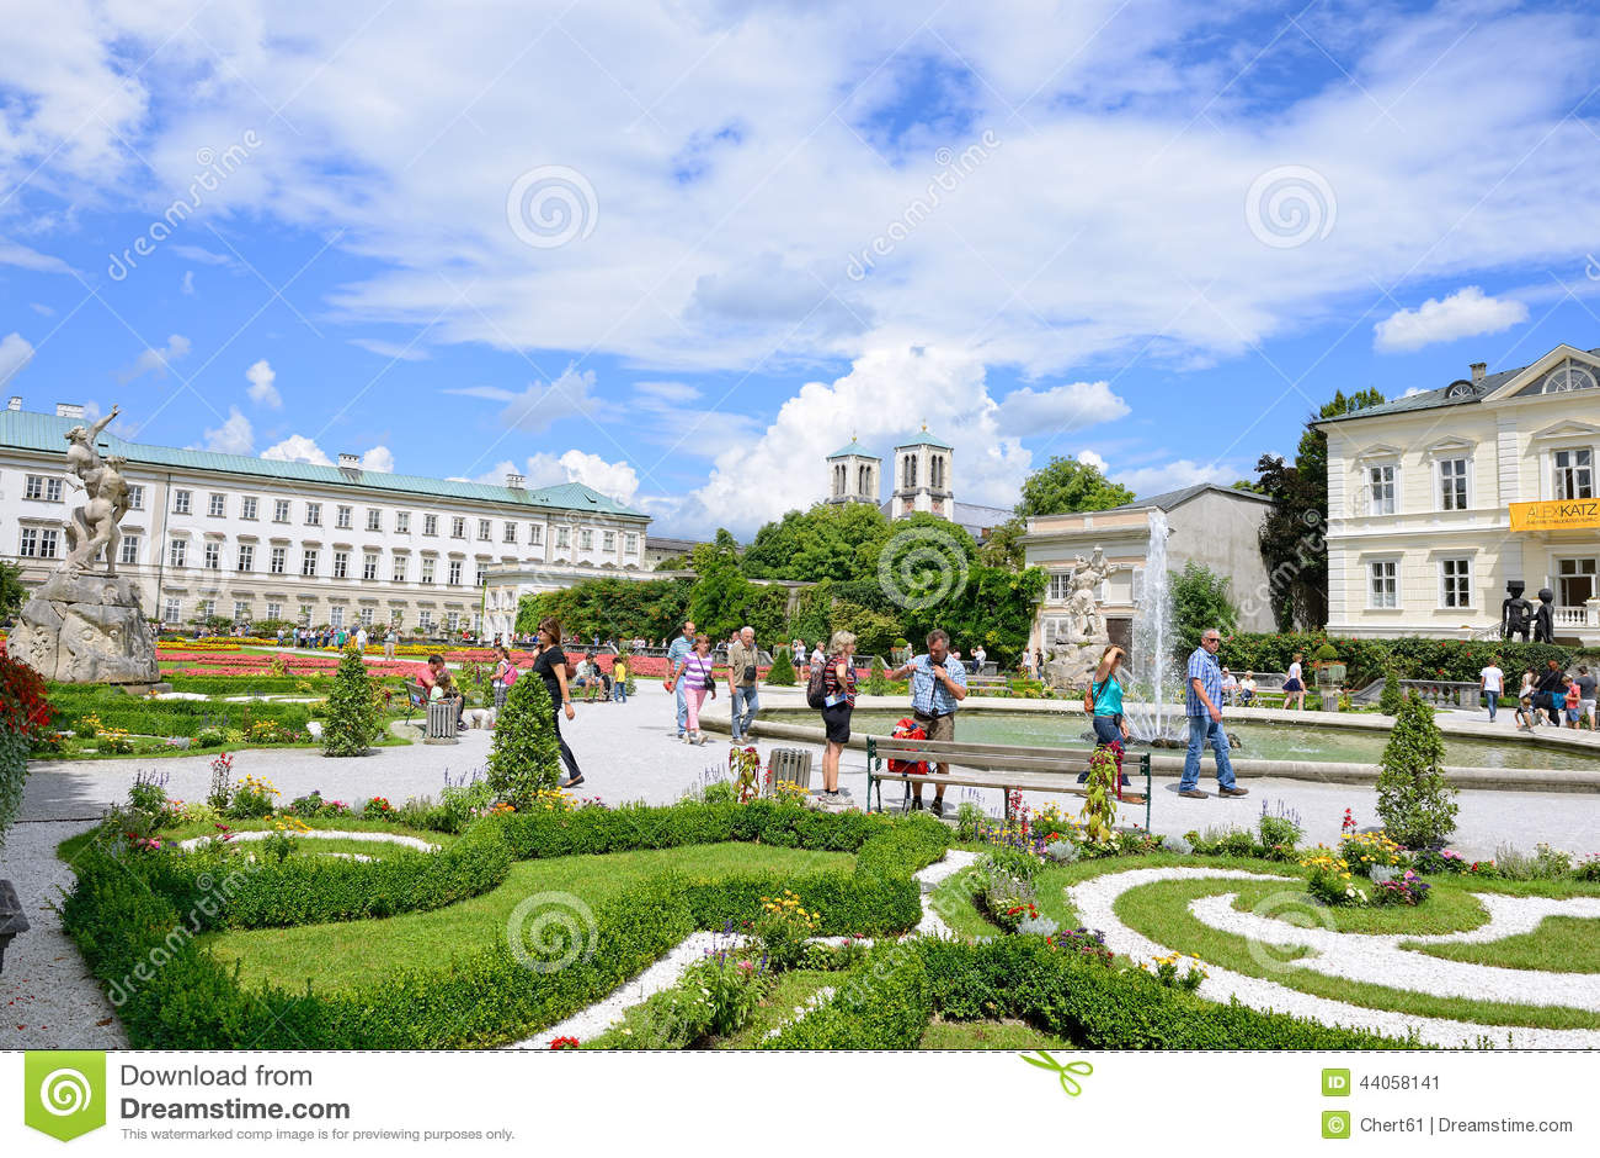 Salzburg Editorial Photo Image 44058141